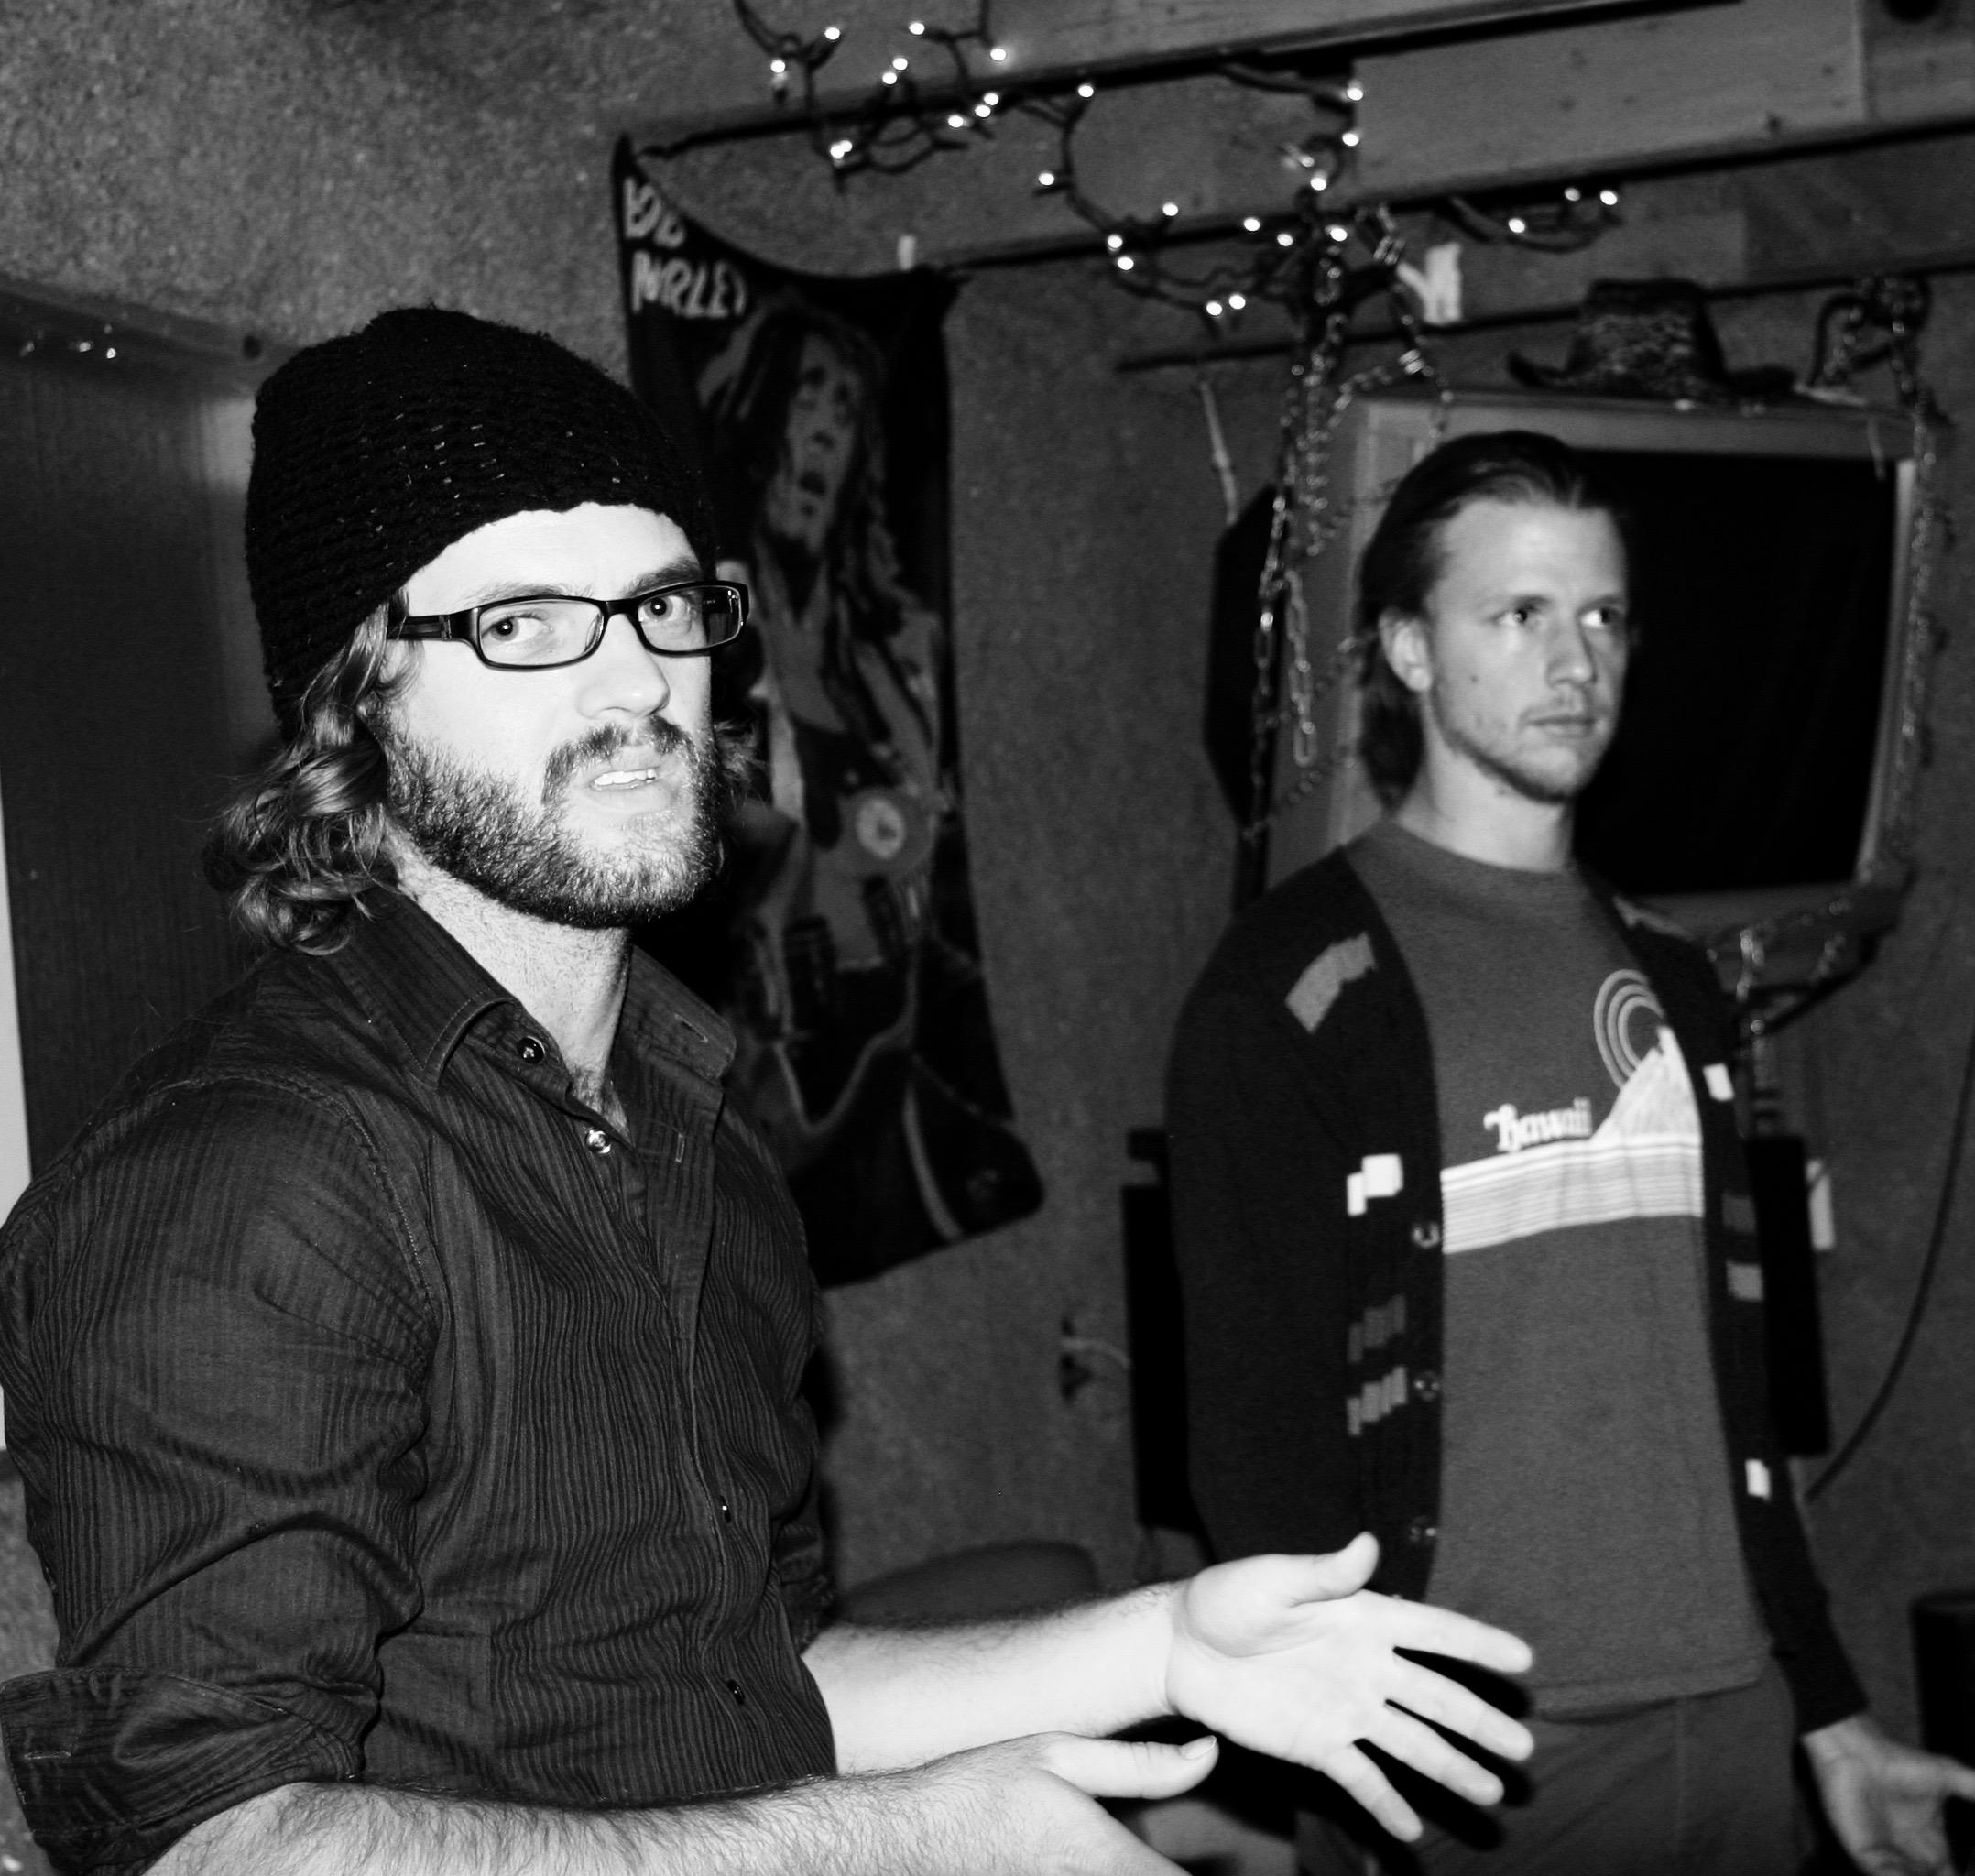 Hunter & Joshua at Studio 700 talkin' 'bout Studio 700.